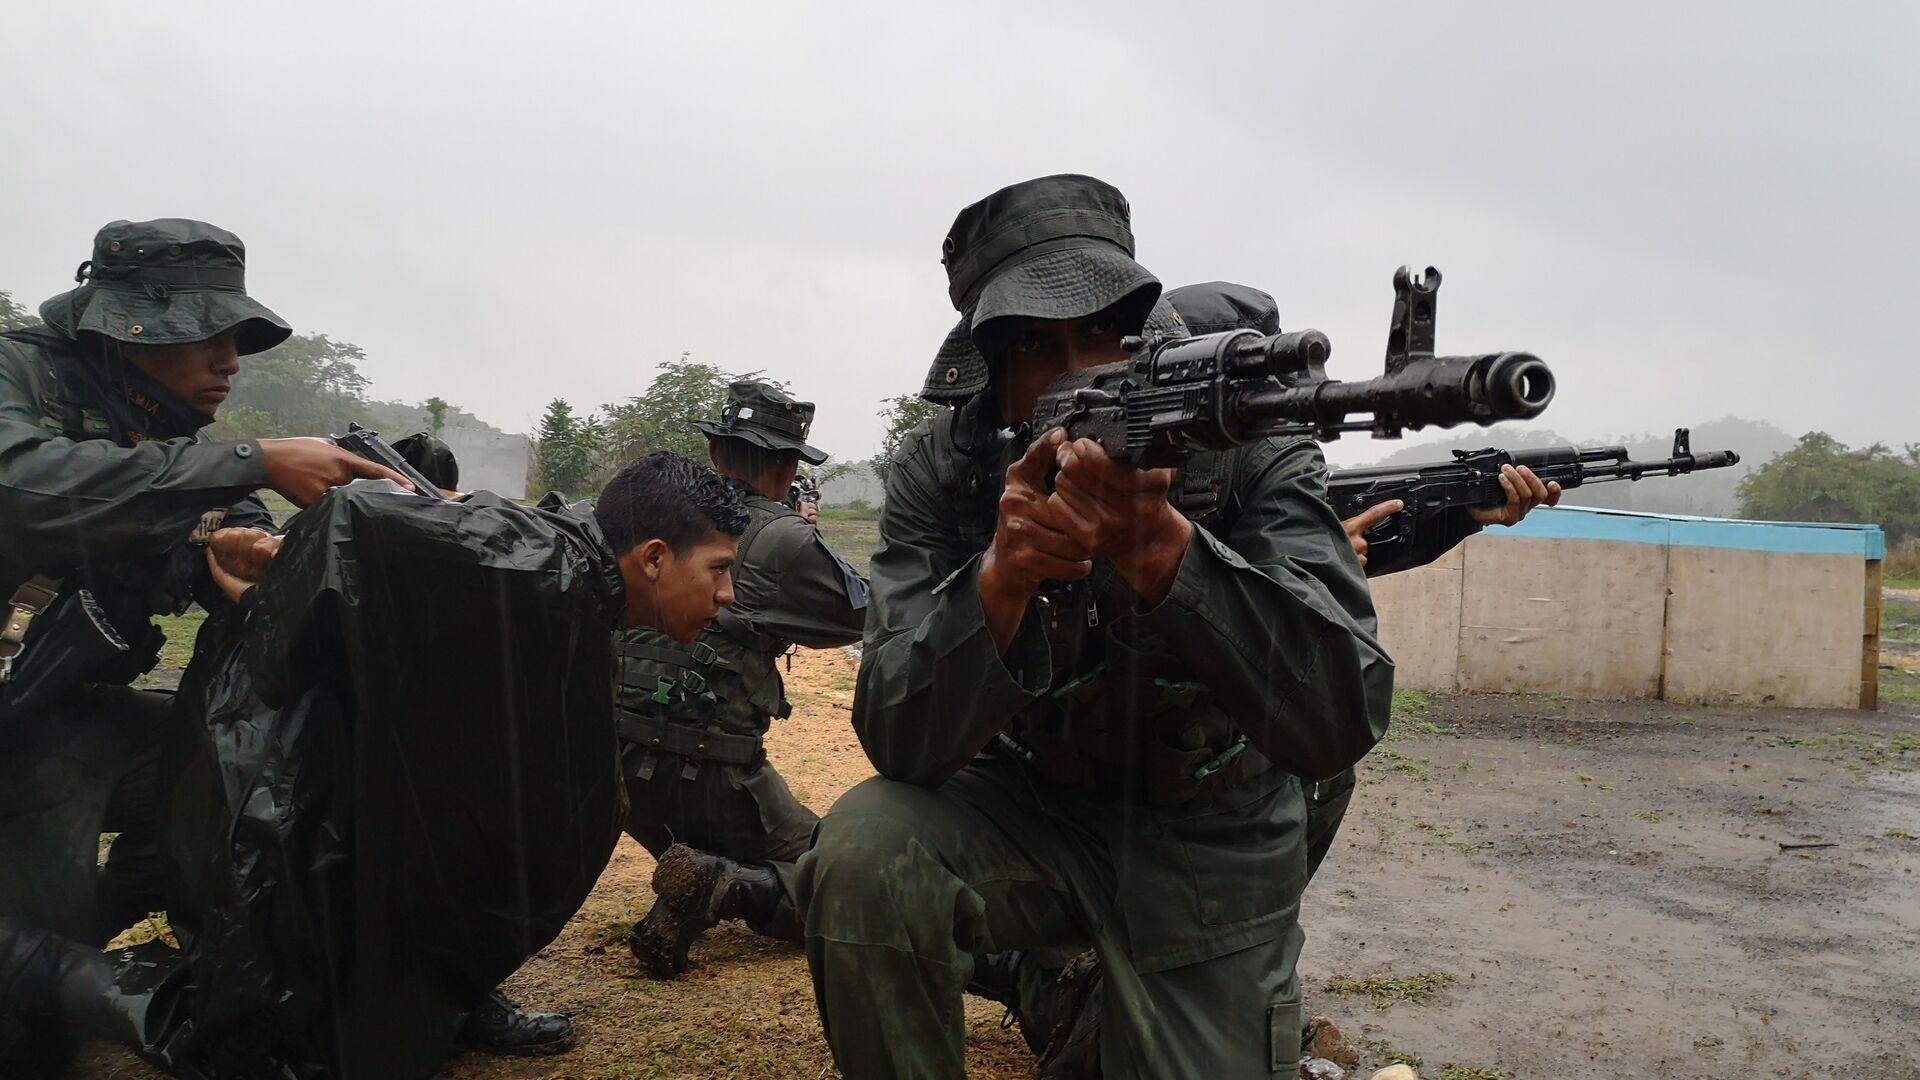 Cadetes de la Academia de la Guardia Nacional Bolivariana, en la cancha de combate en áreas construidas - Sputnik Mundo, 1920, 04.08.2021